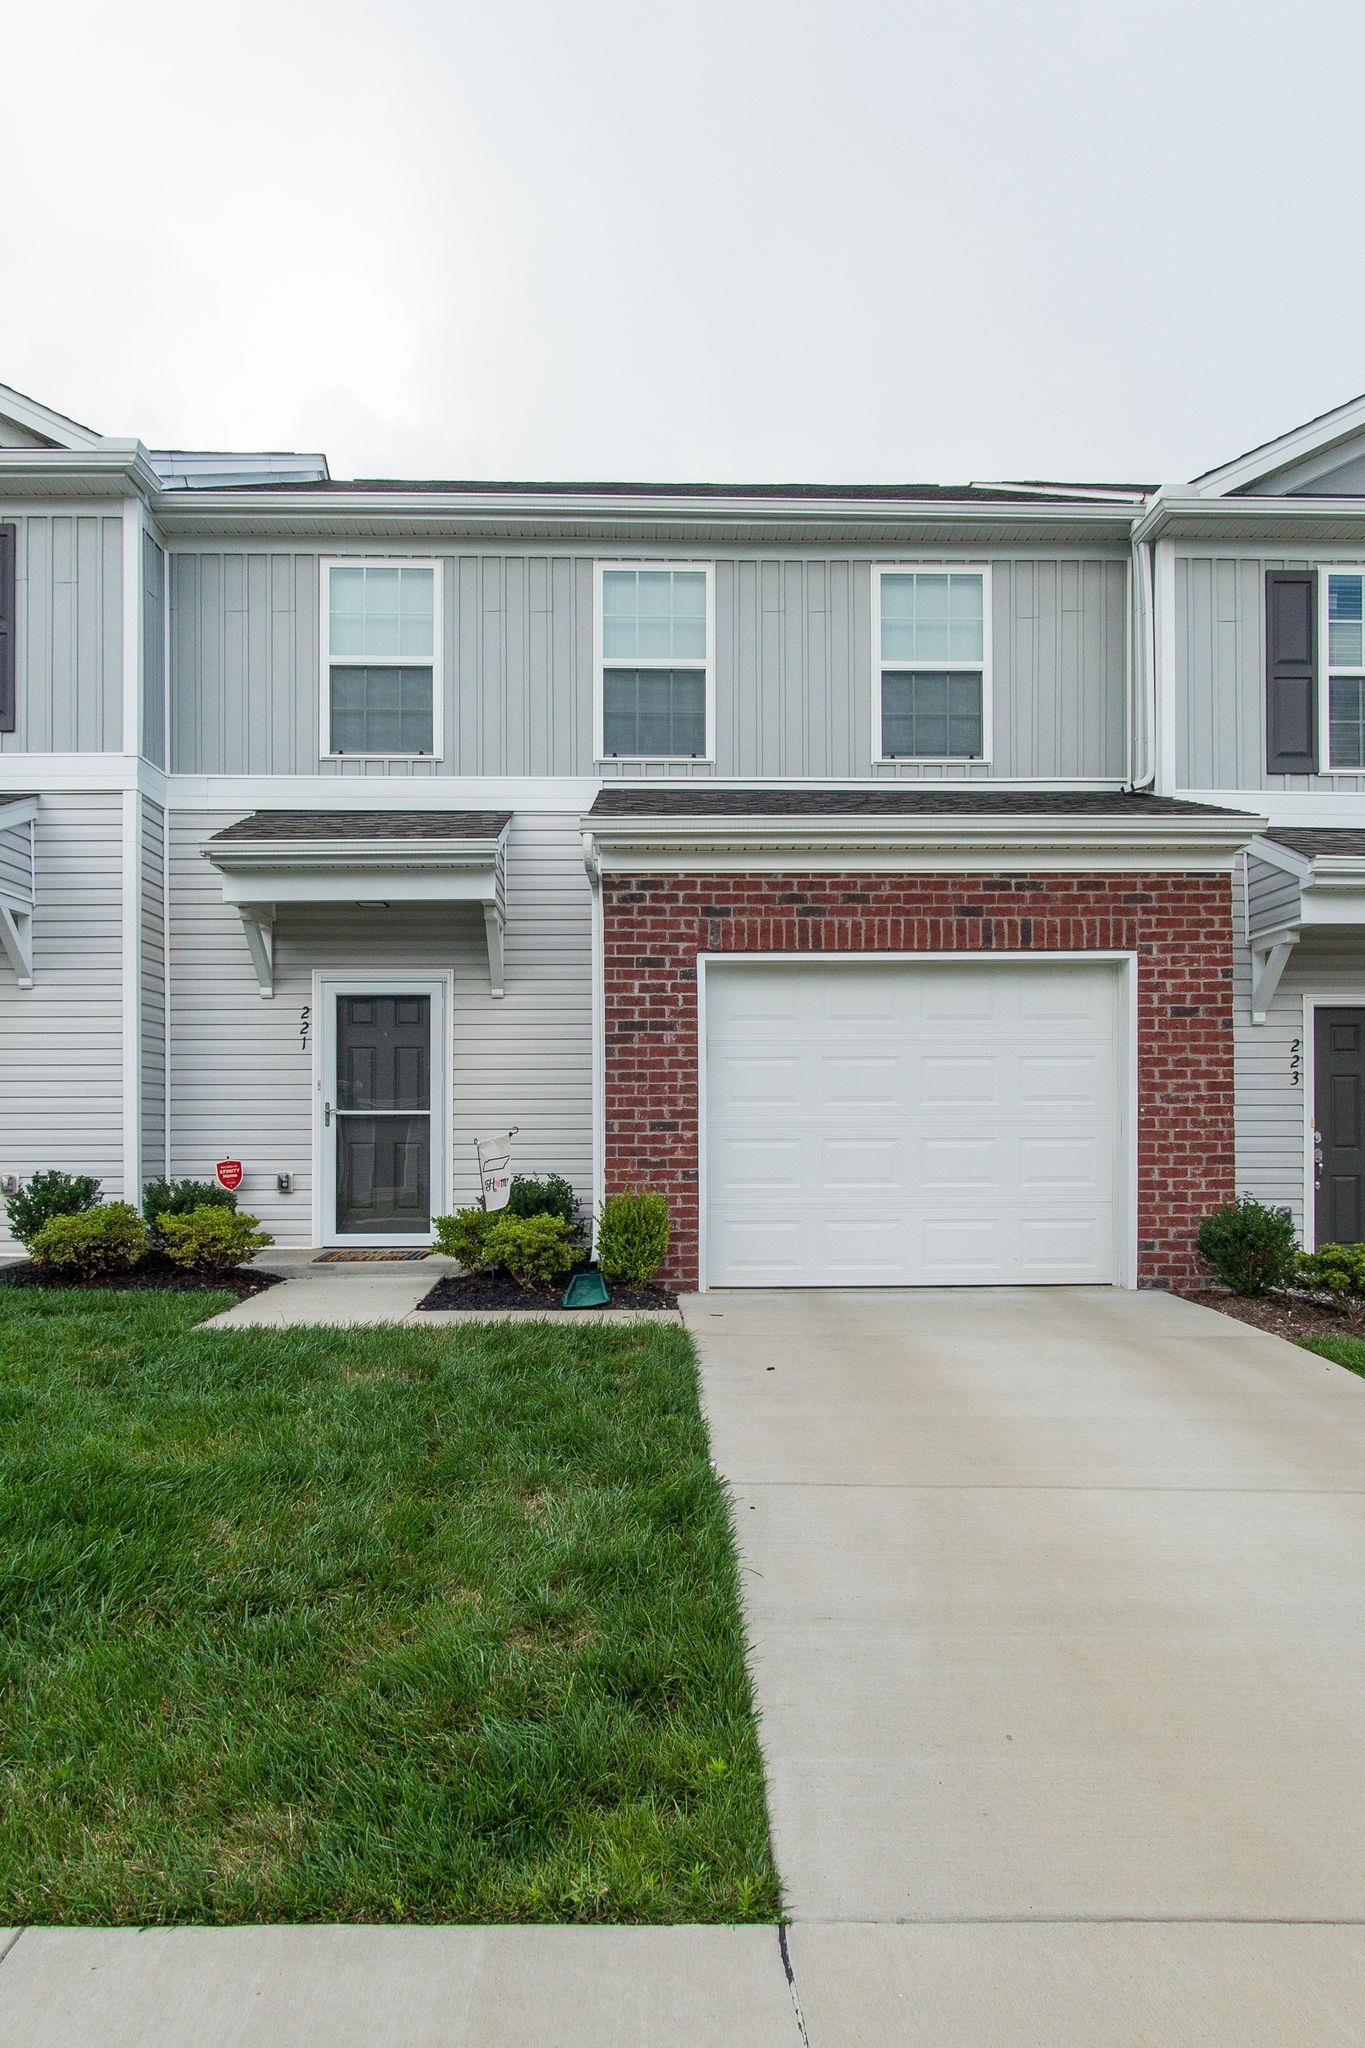 3030 Ned Shelton Rd Apt 221, Nashville, TN 37217 - Nashville, TN real estate listing